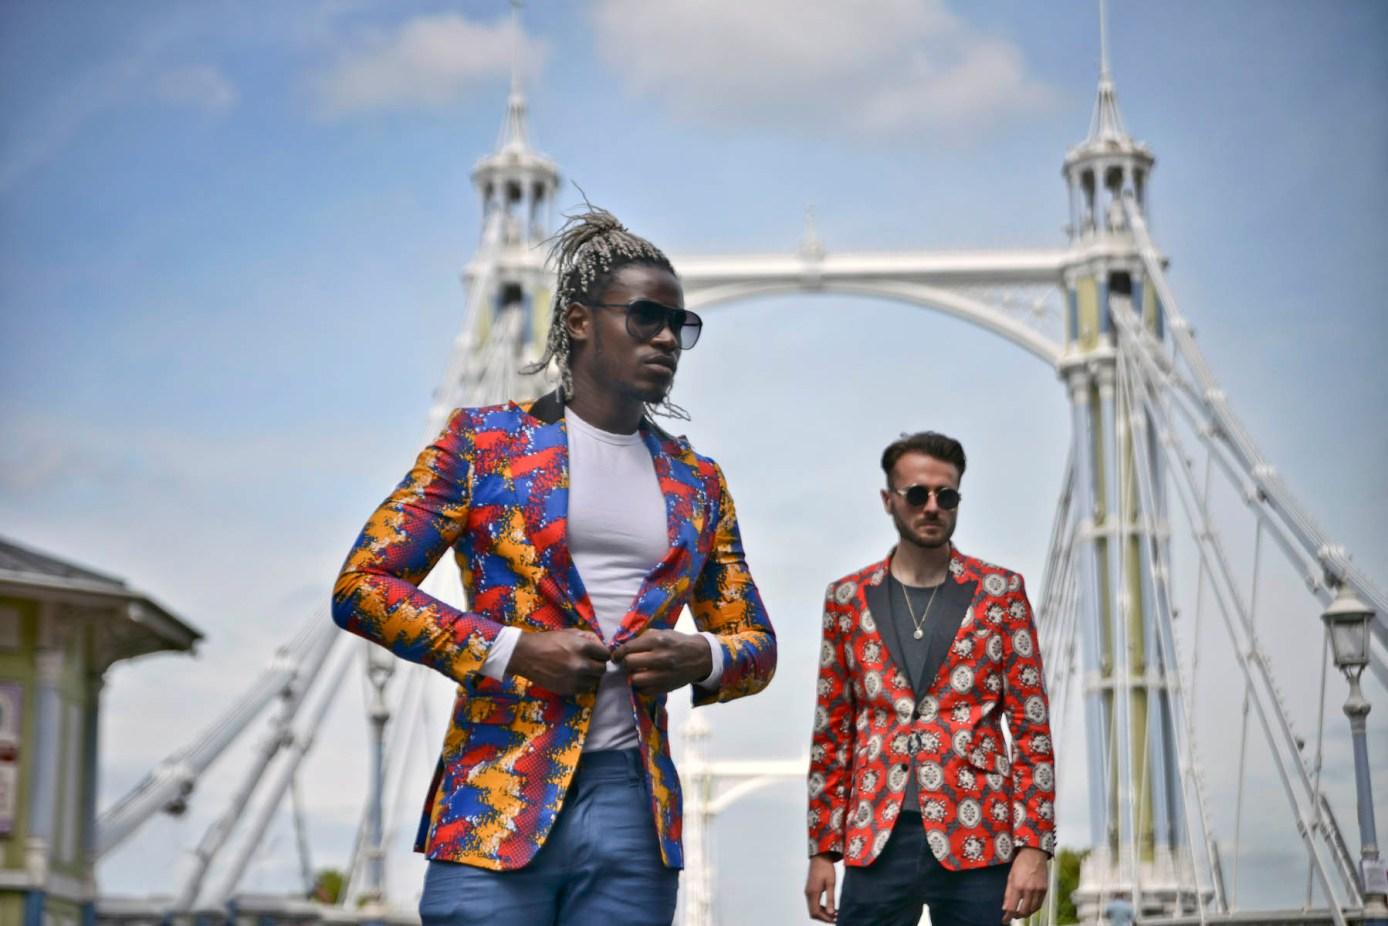 Fashion_lifestyle_photographer_london (23)